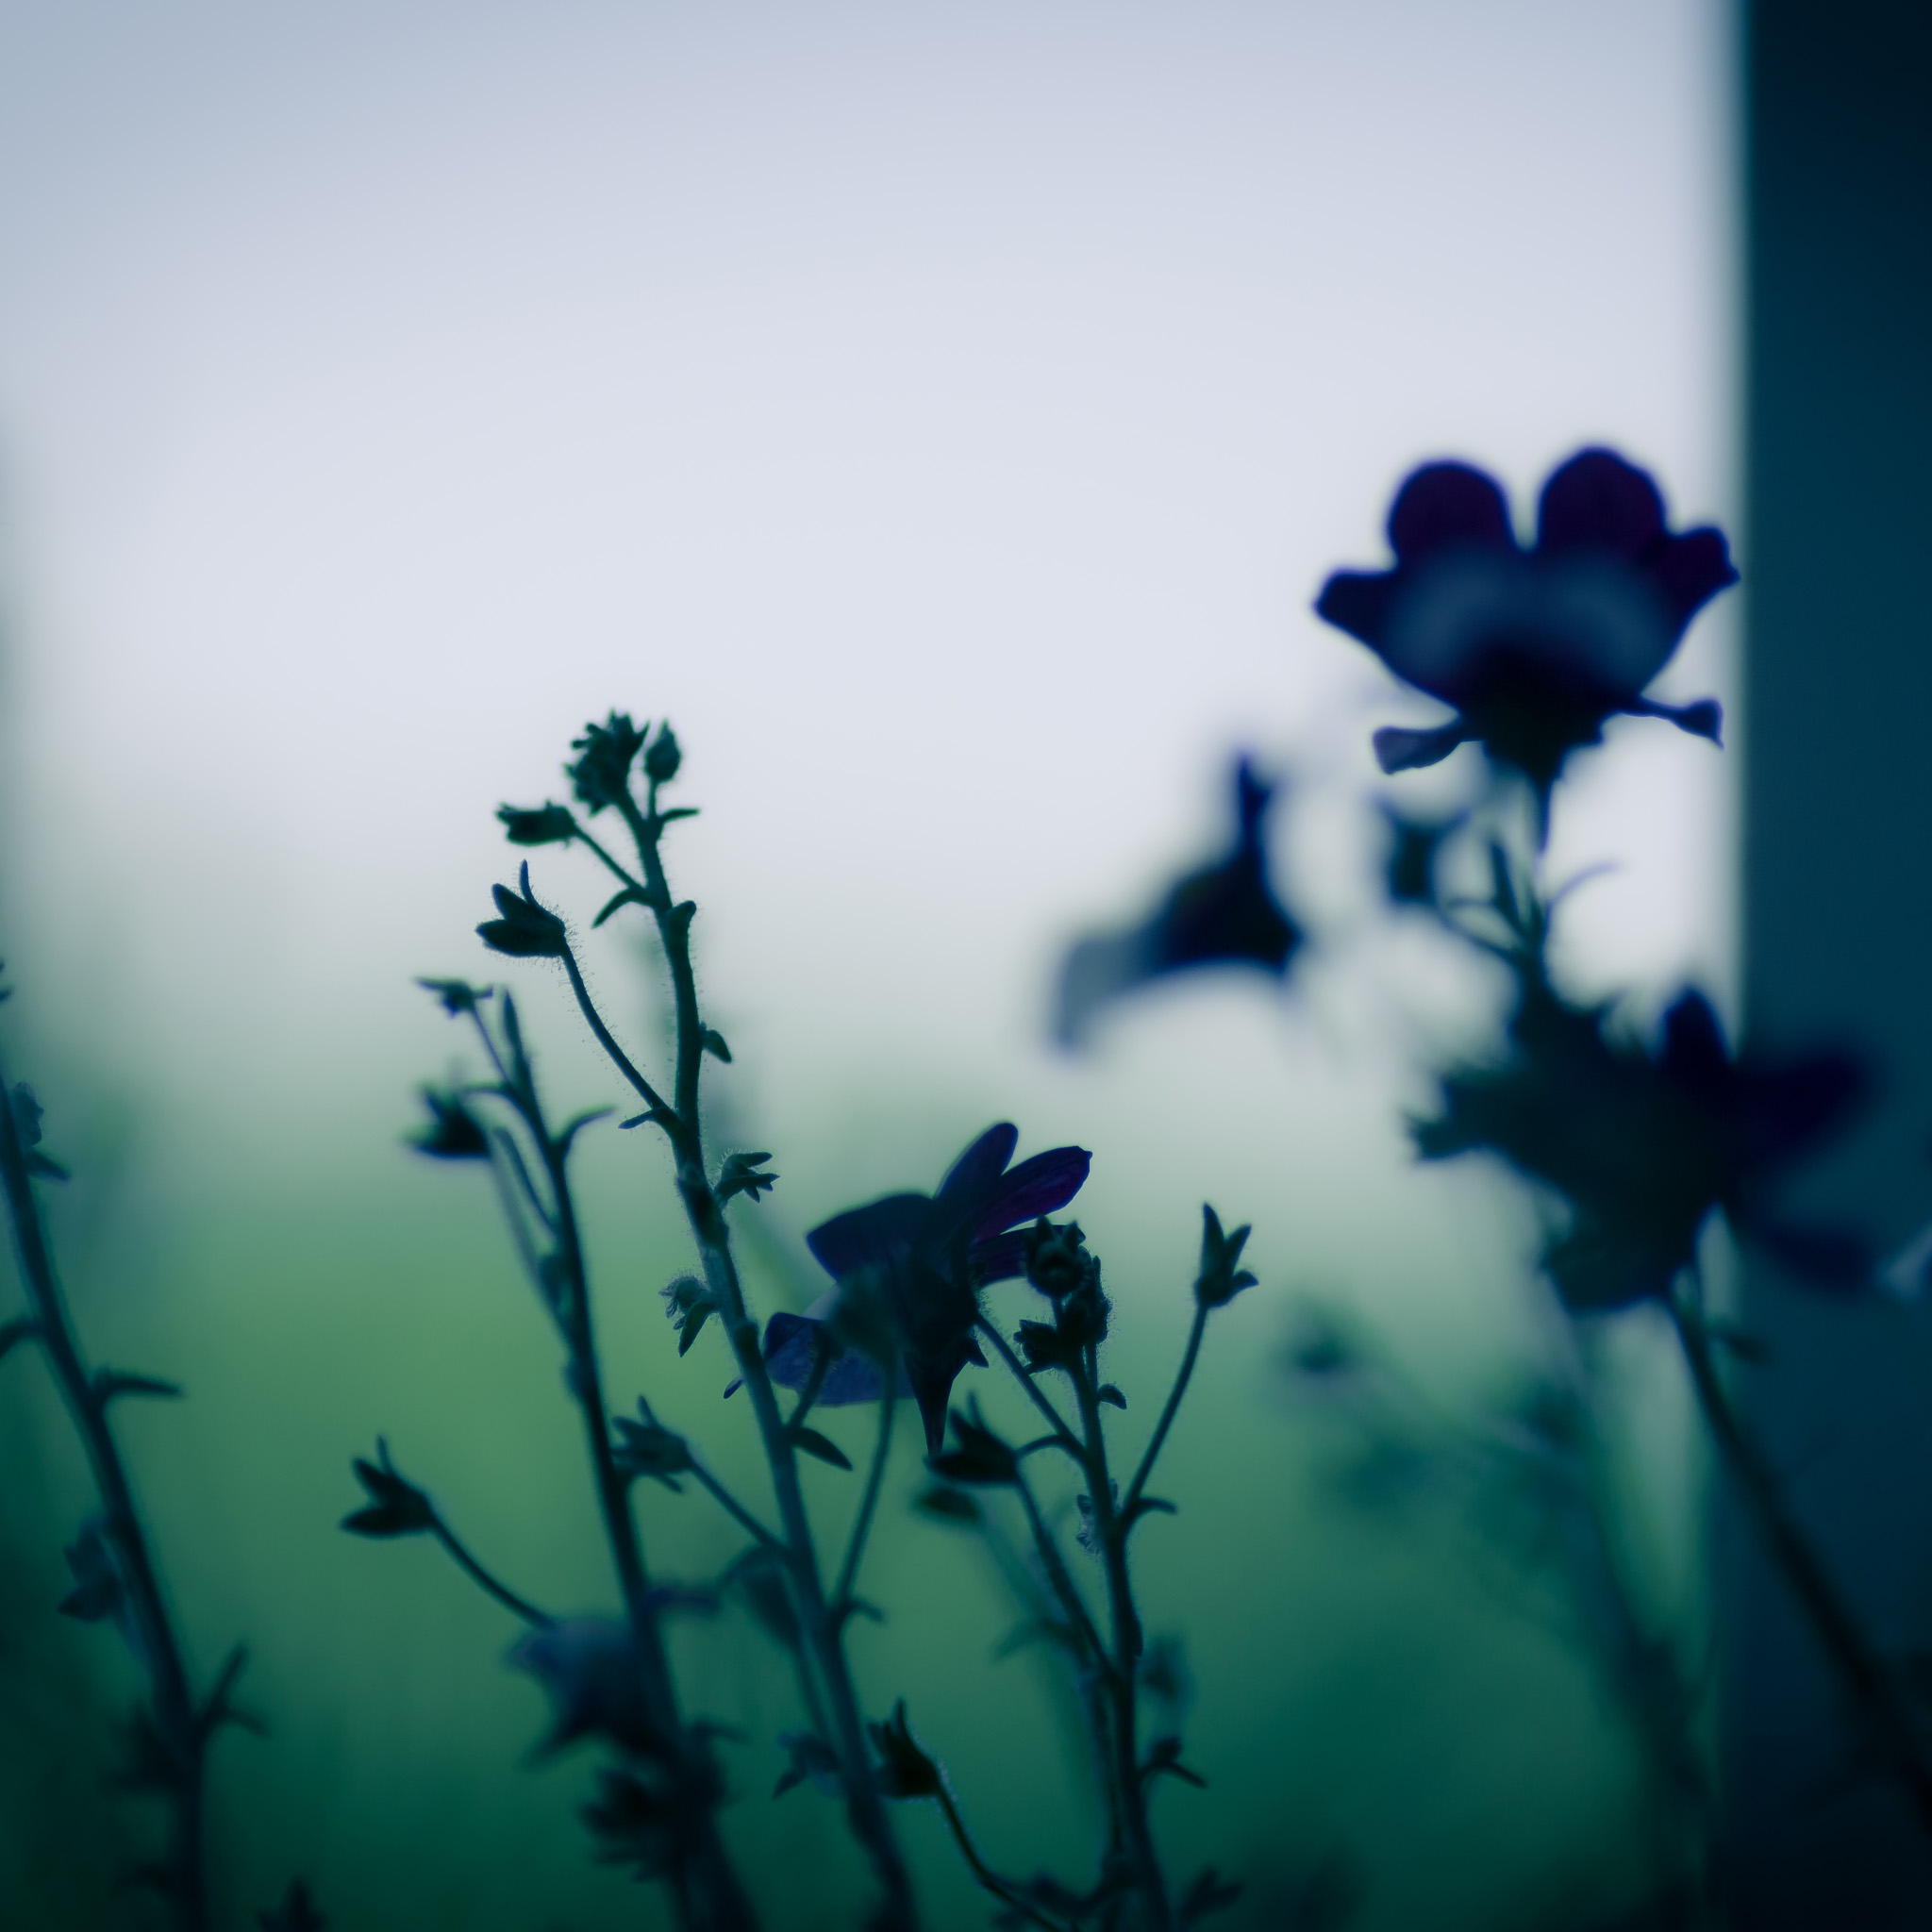 paul longinidis - dark flowers ipad wallpaper